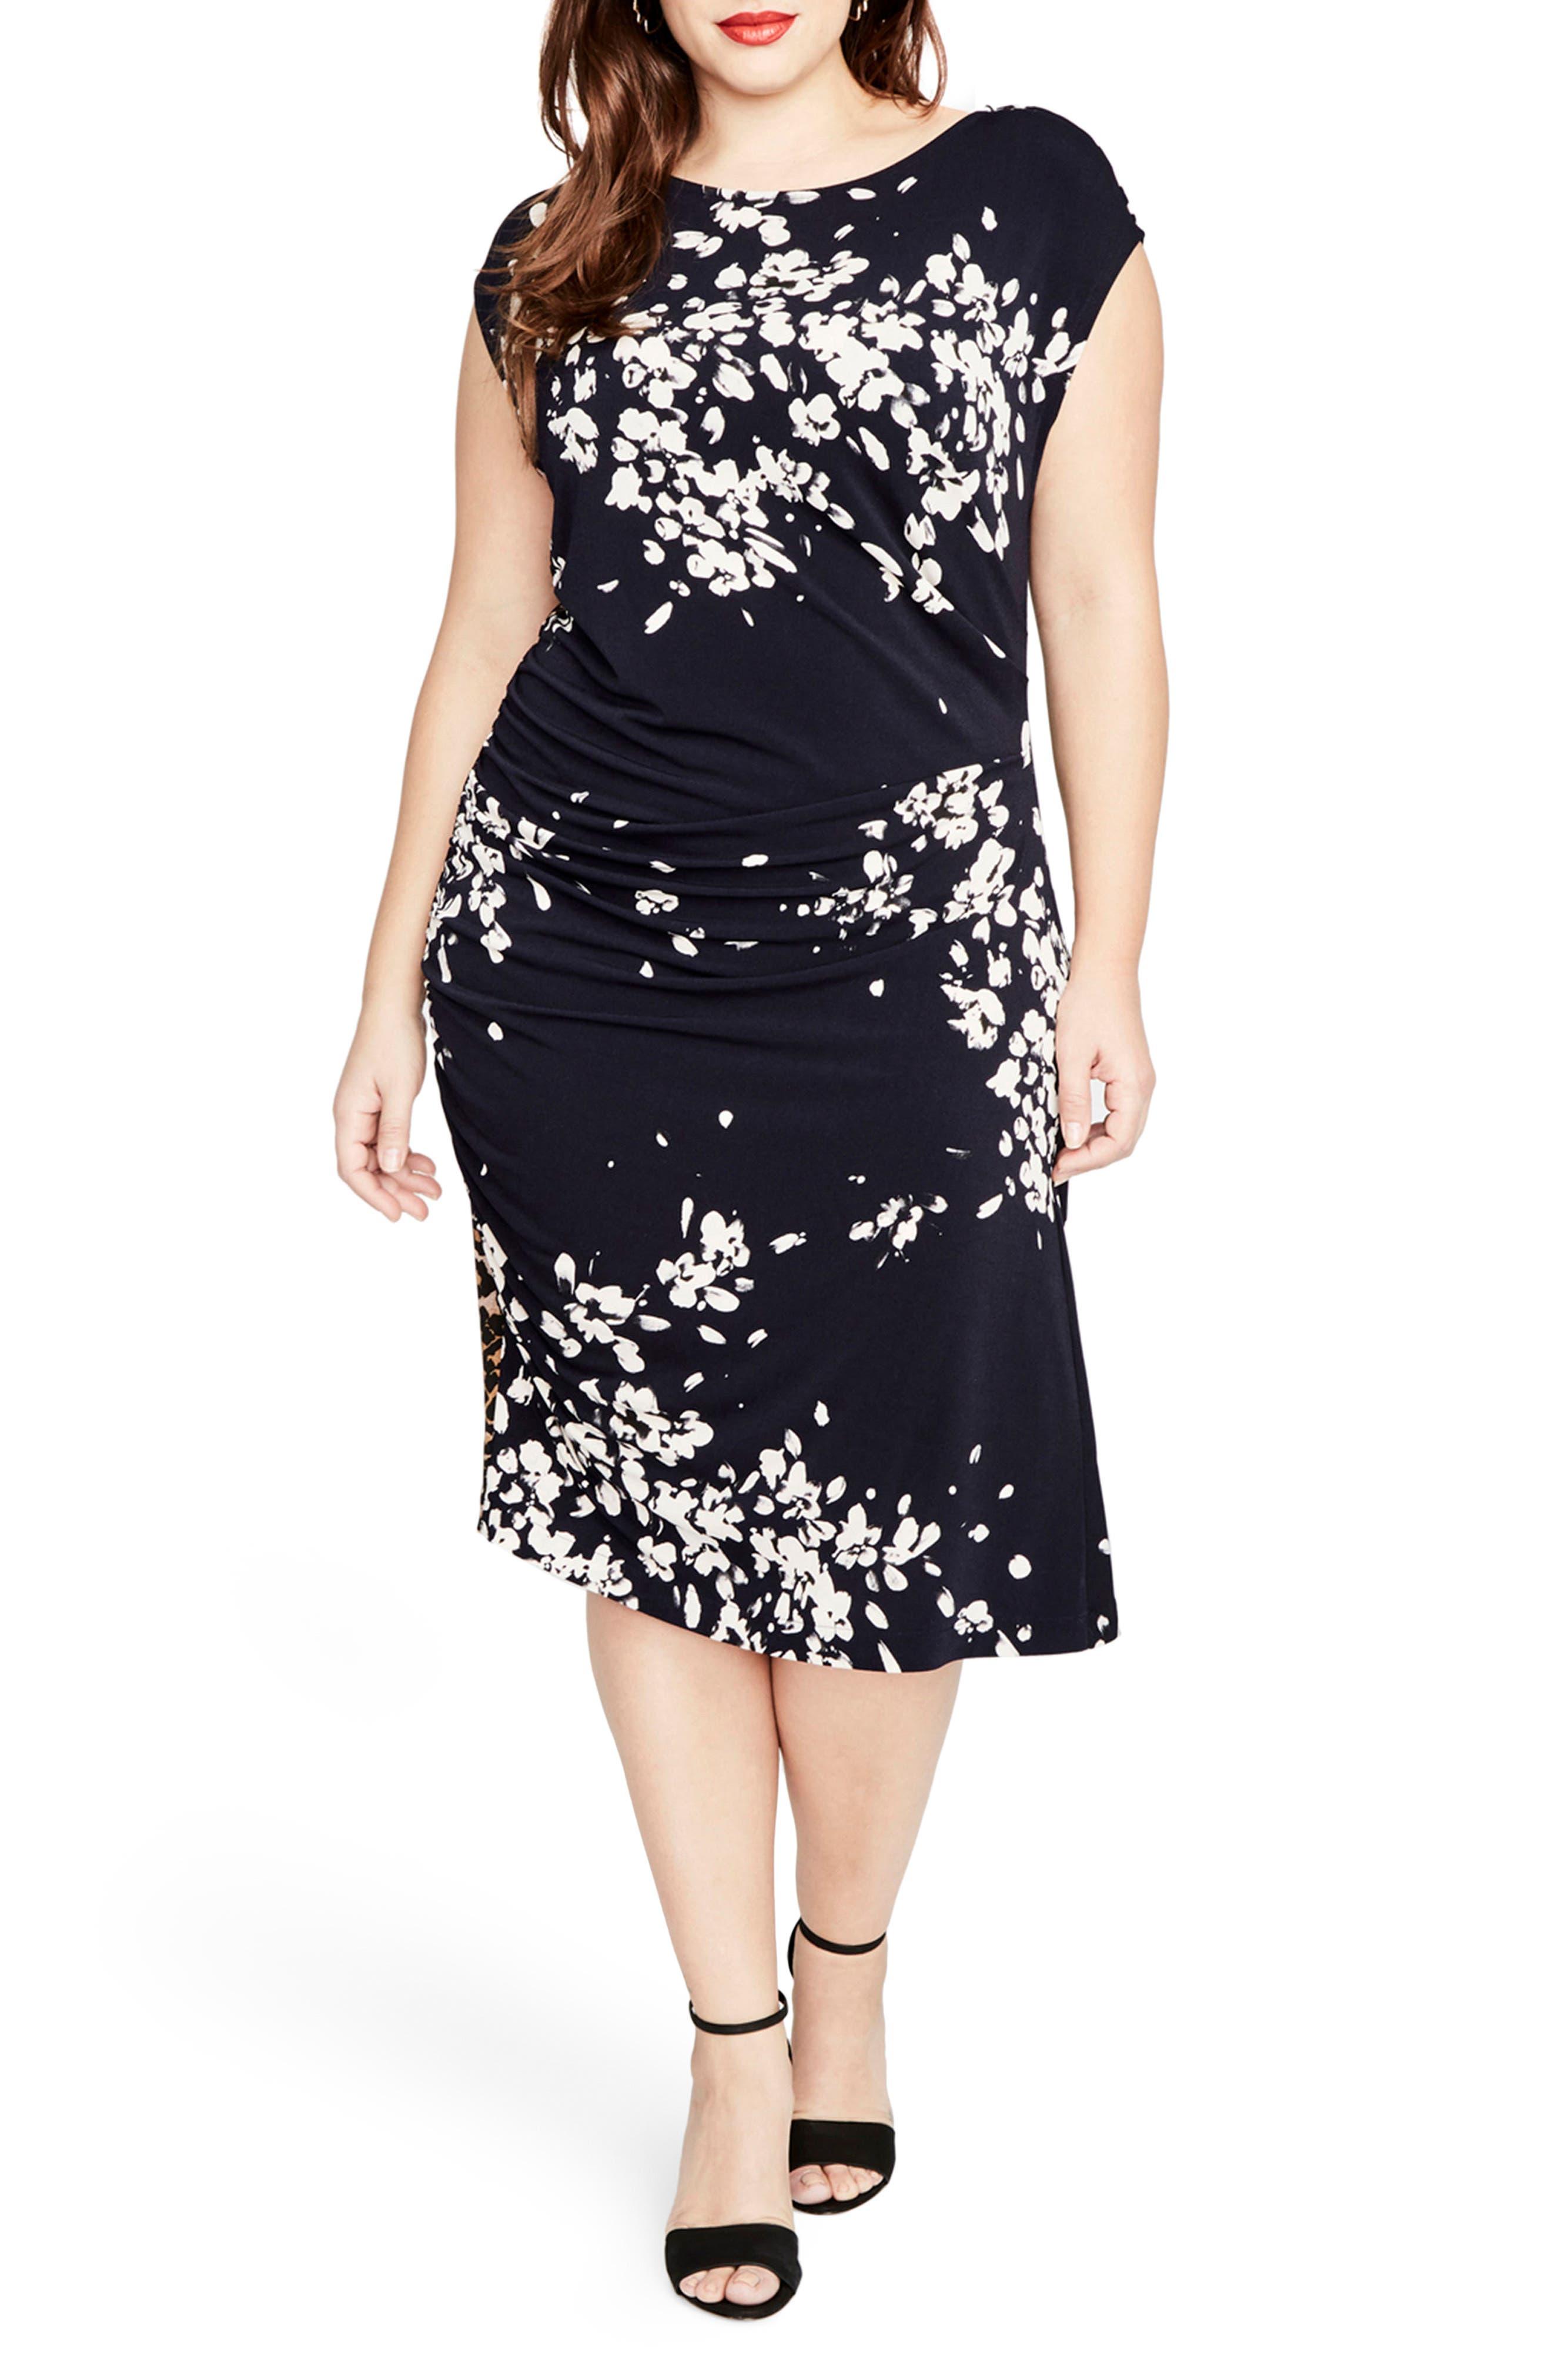 Main Image - RACHEL BY Rachel Roy Asymmetrical Floral Dress (Plus Size)